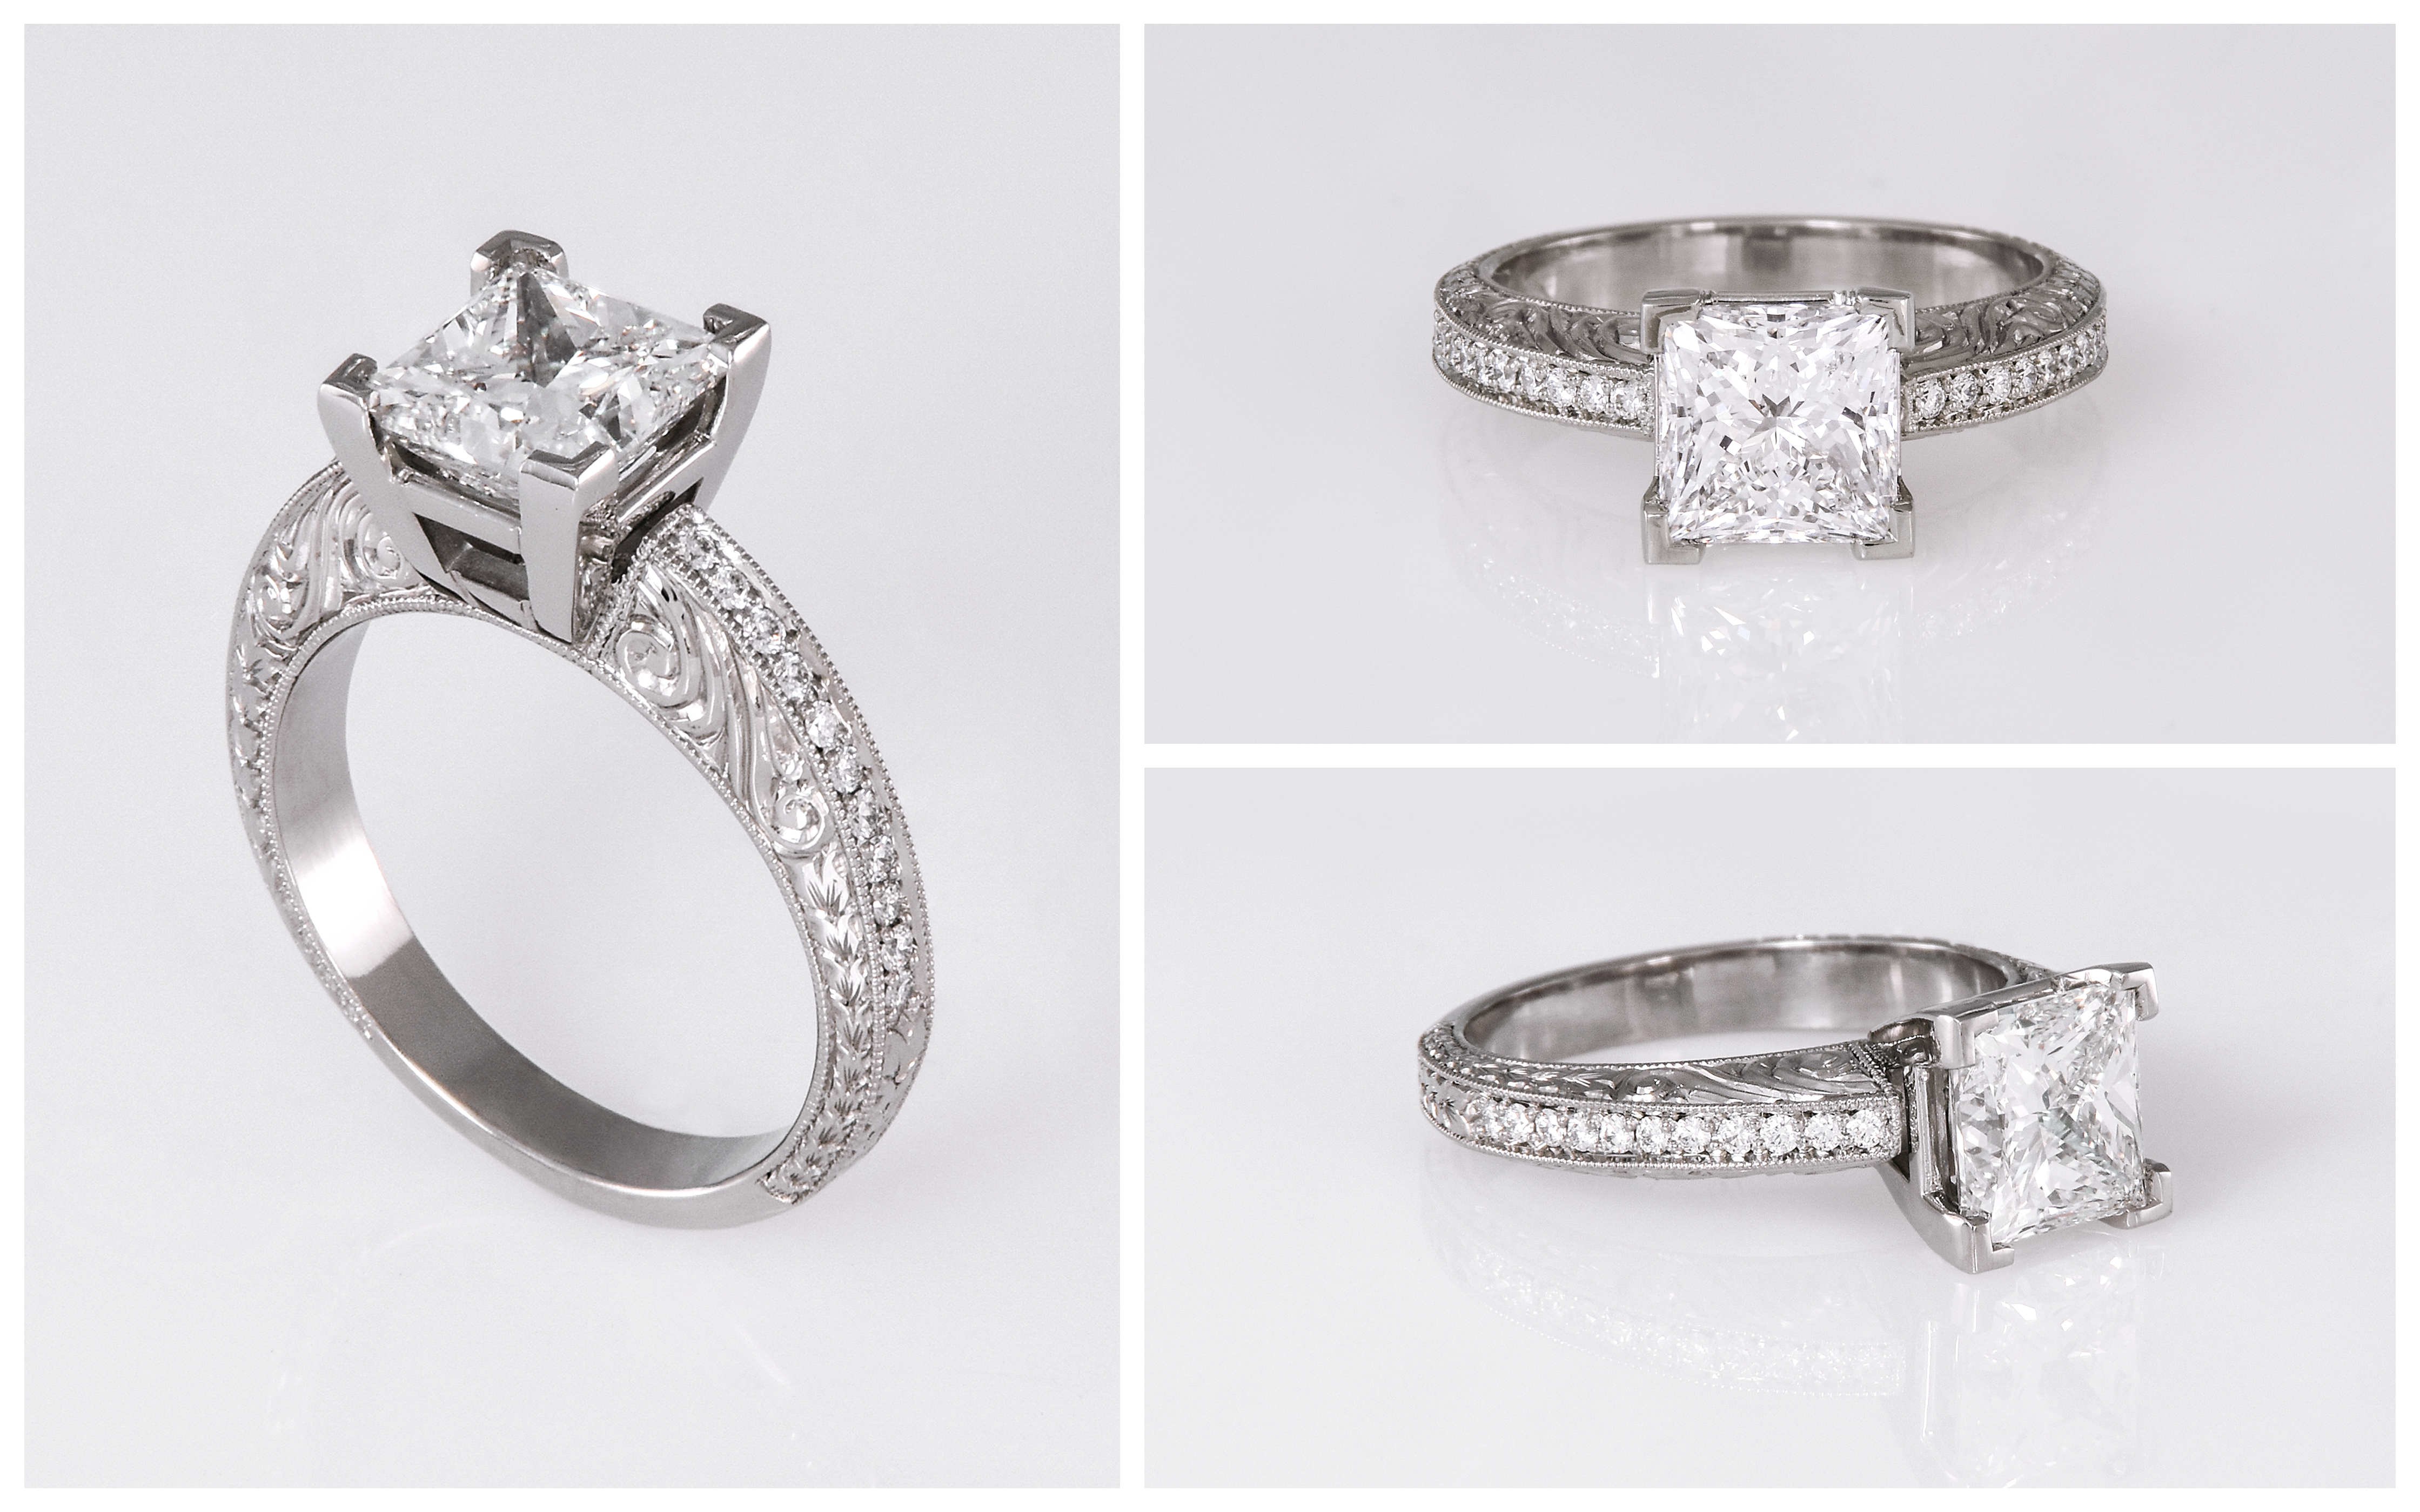 Hand Engraved Princess Cut Diamond Engagement Ring